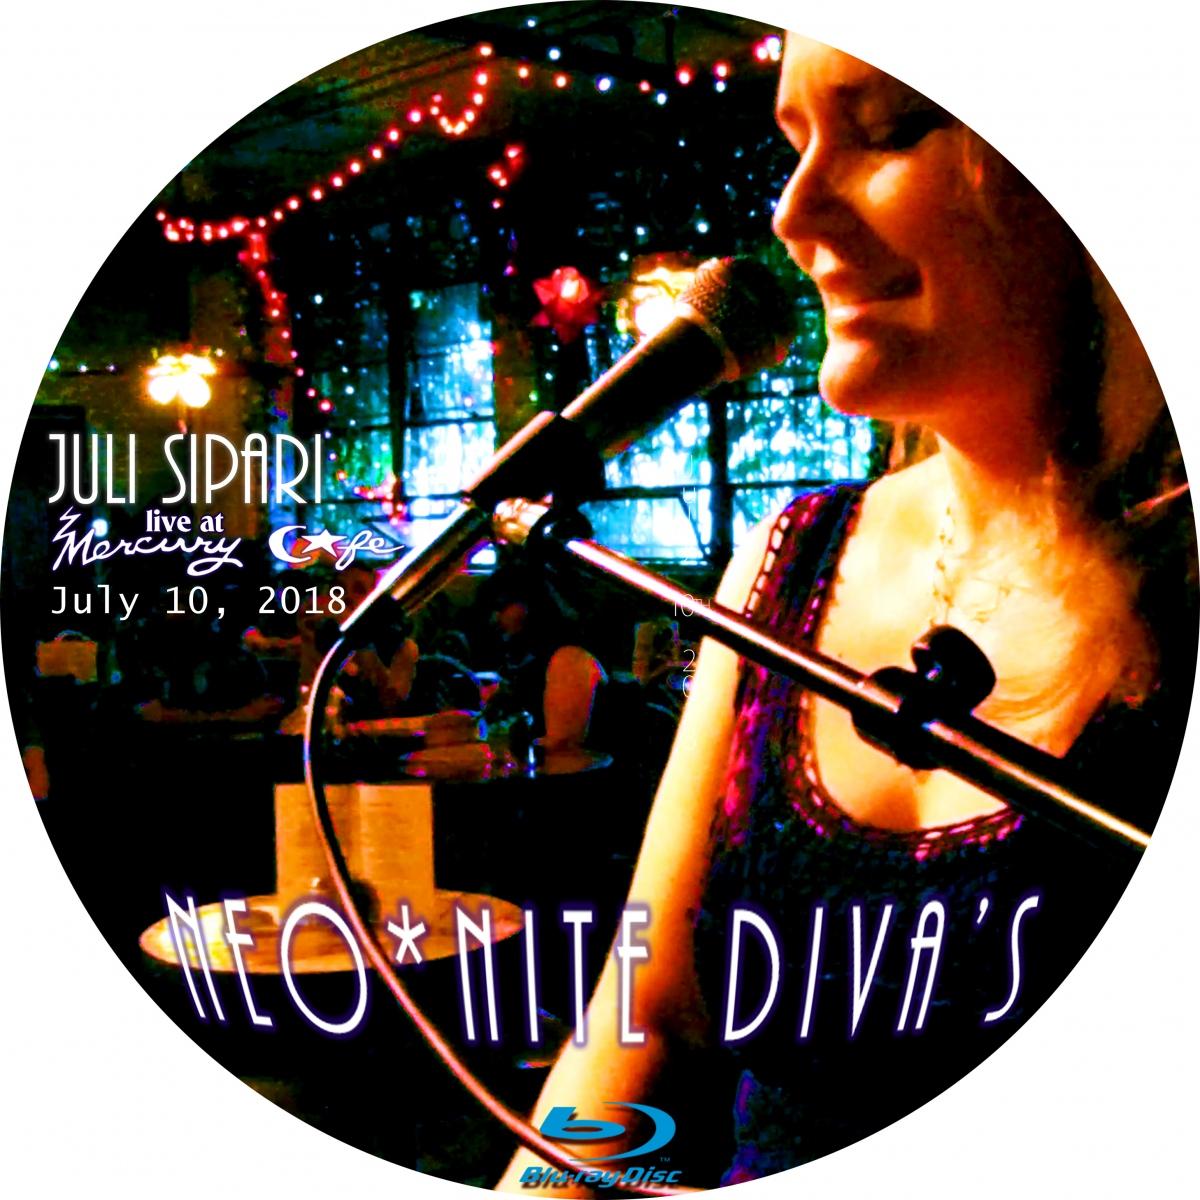 Juli Sipari Neo*Nite Diva Blu-Ray Disc Art